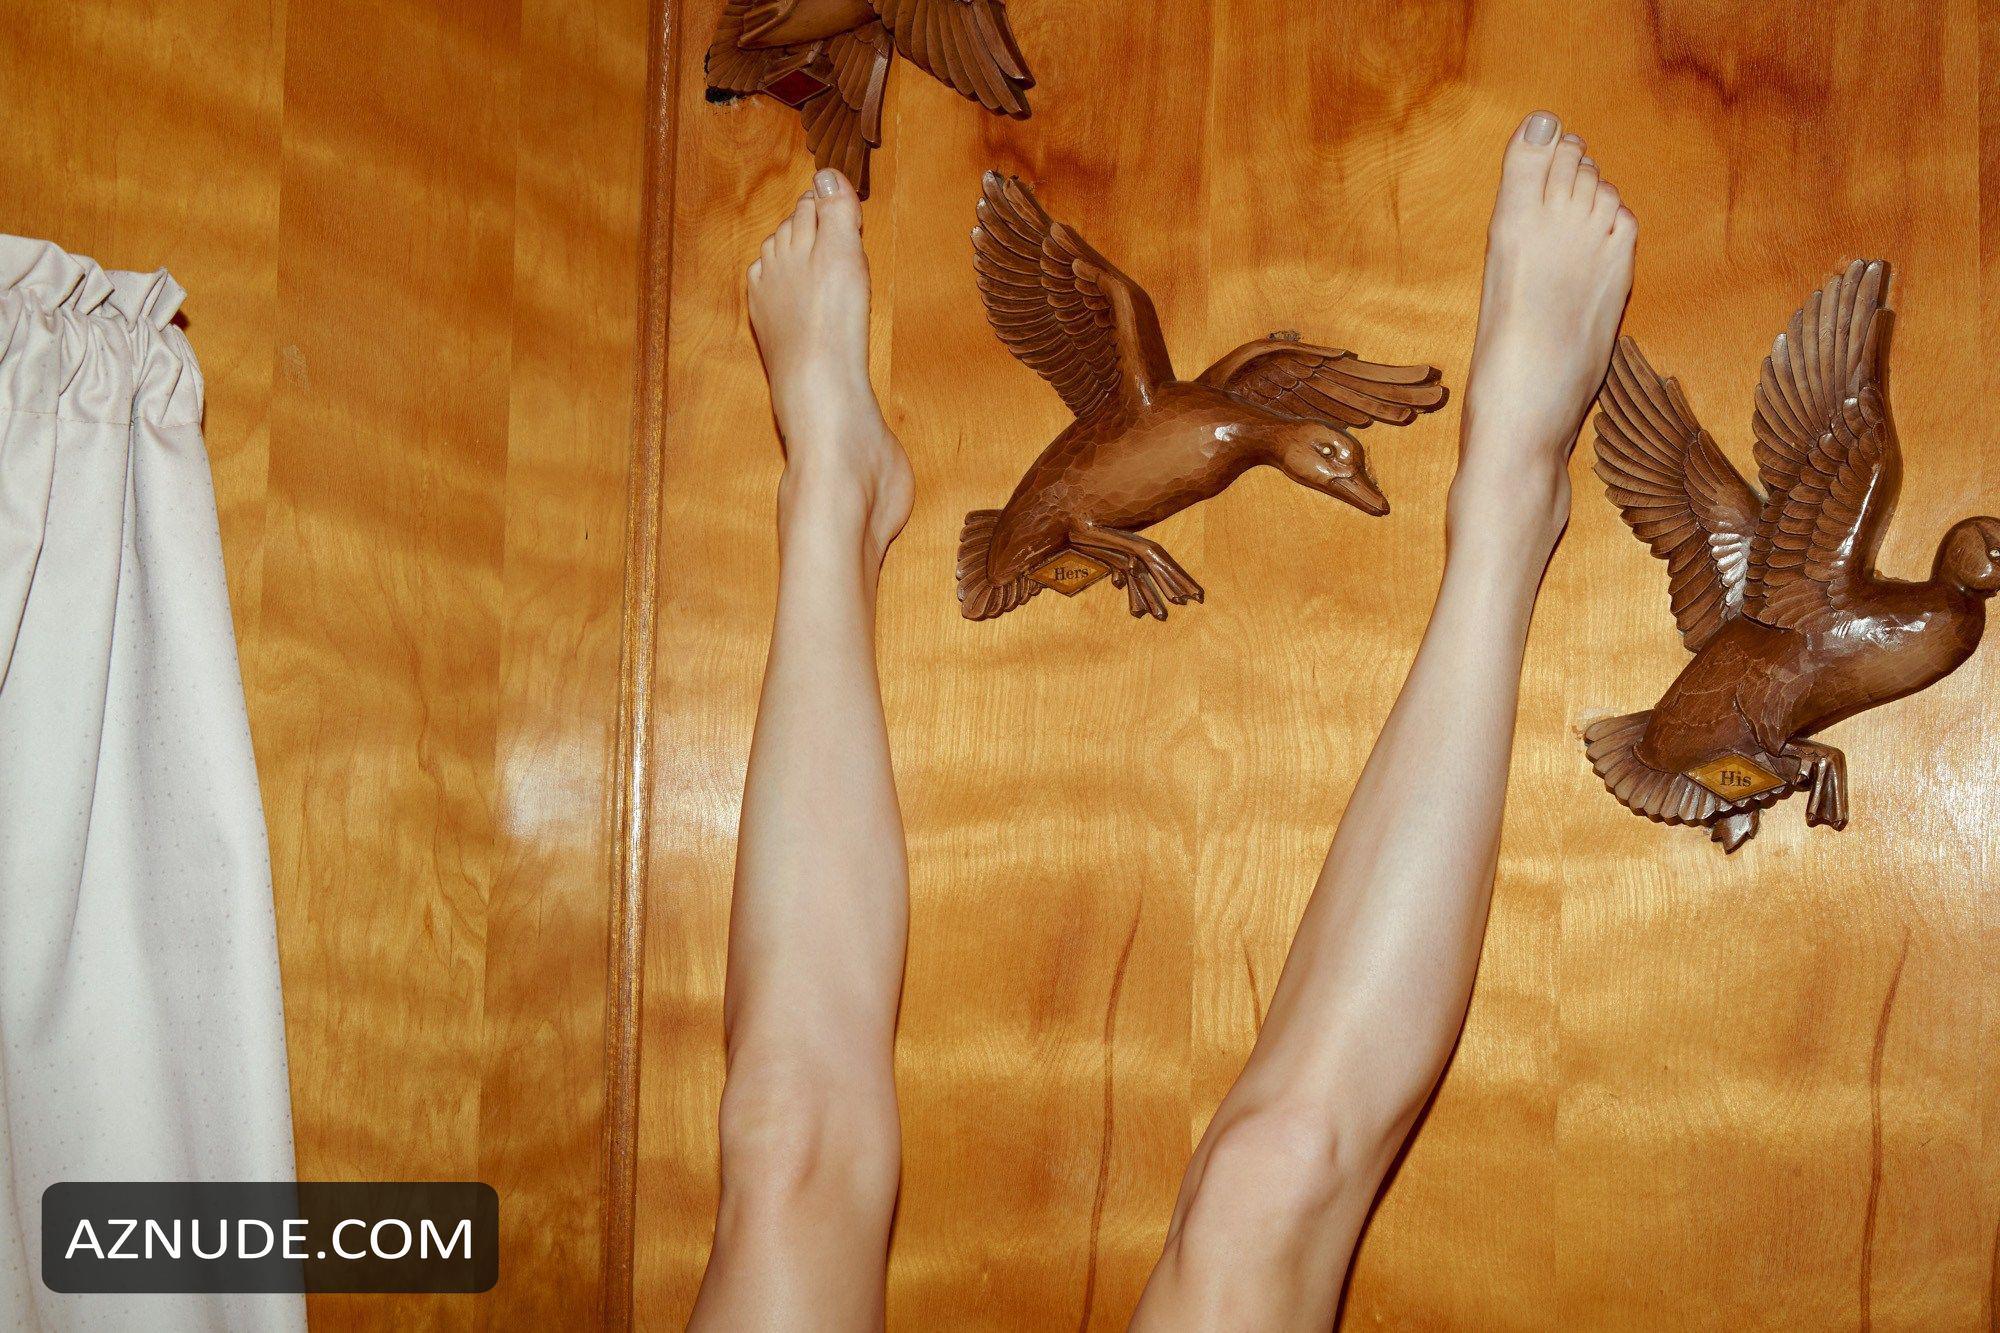 Ashley Smith Porn ashley smith nude and sexyclaire rothstein - aznude